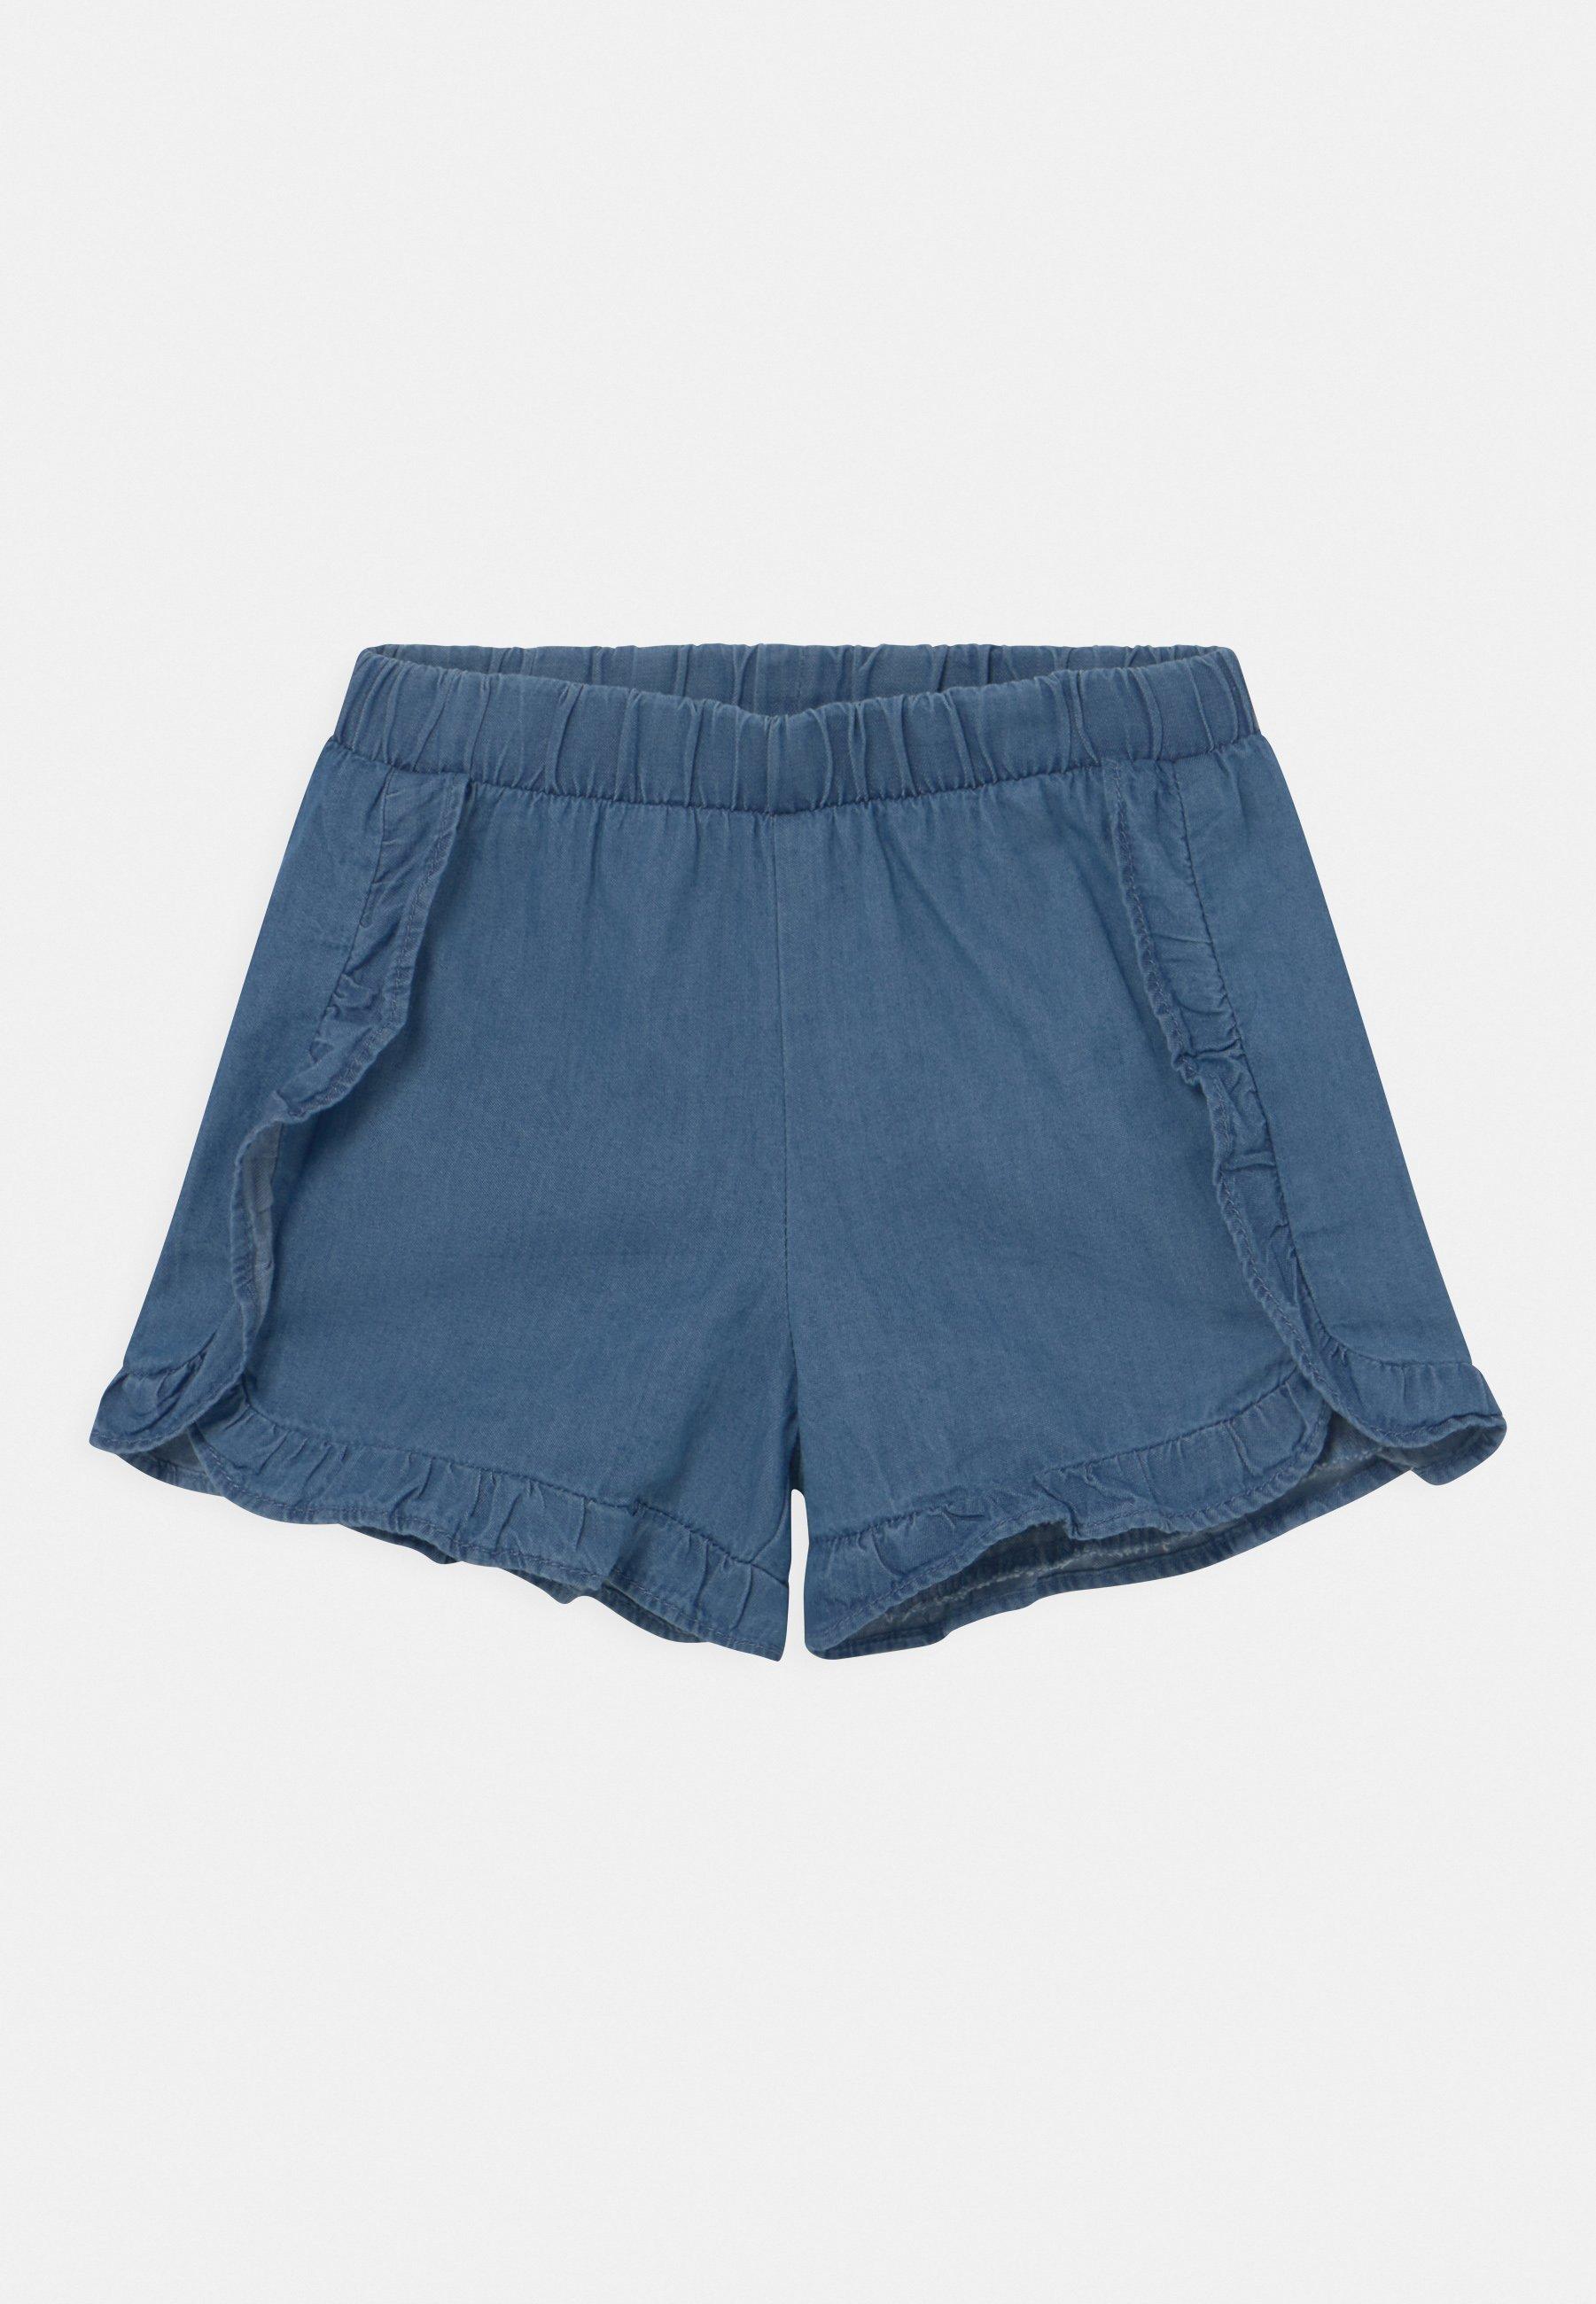 Kids SMALL GIRLS  - Denim shorts